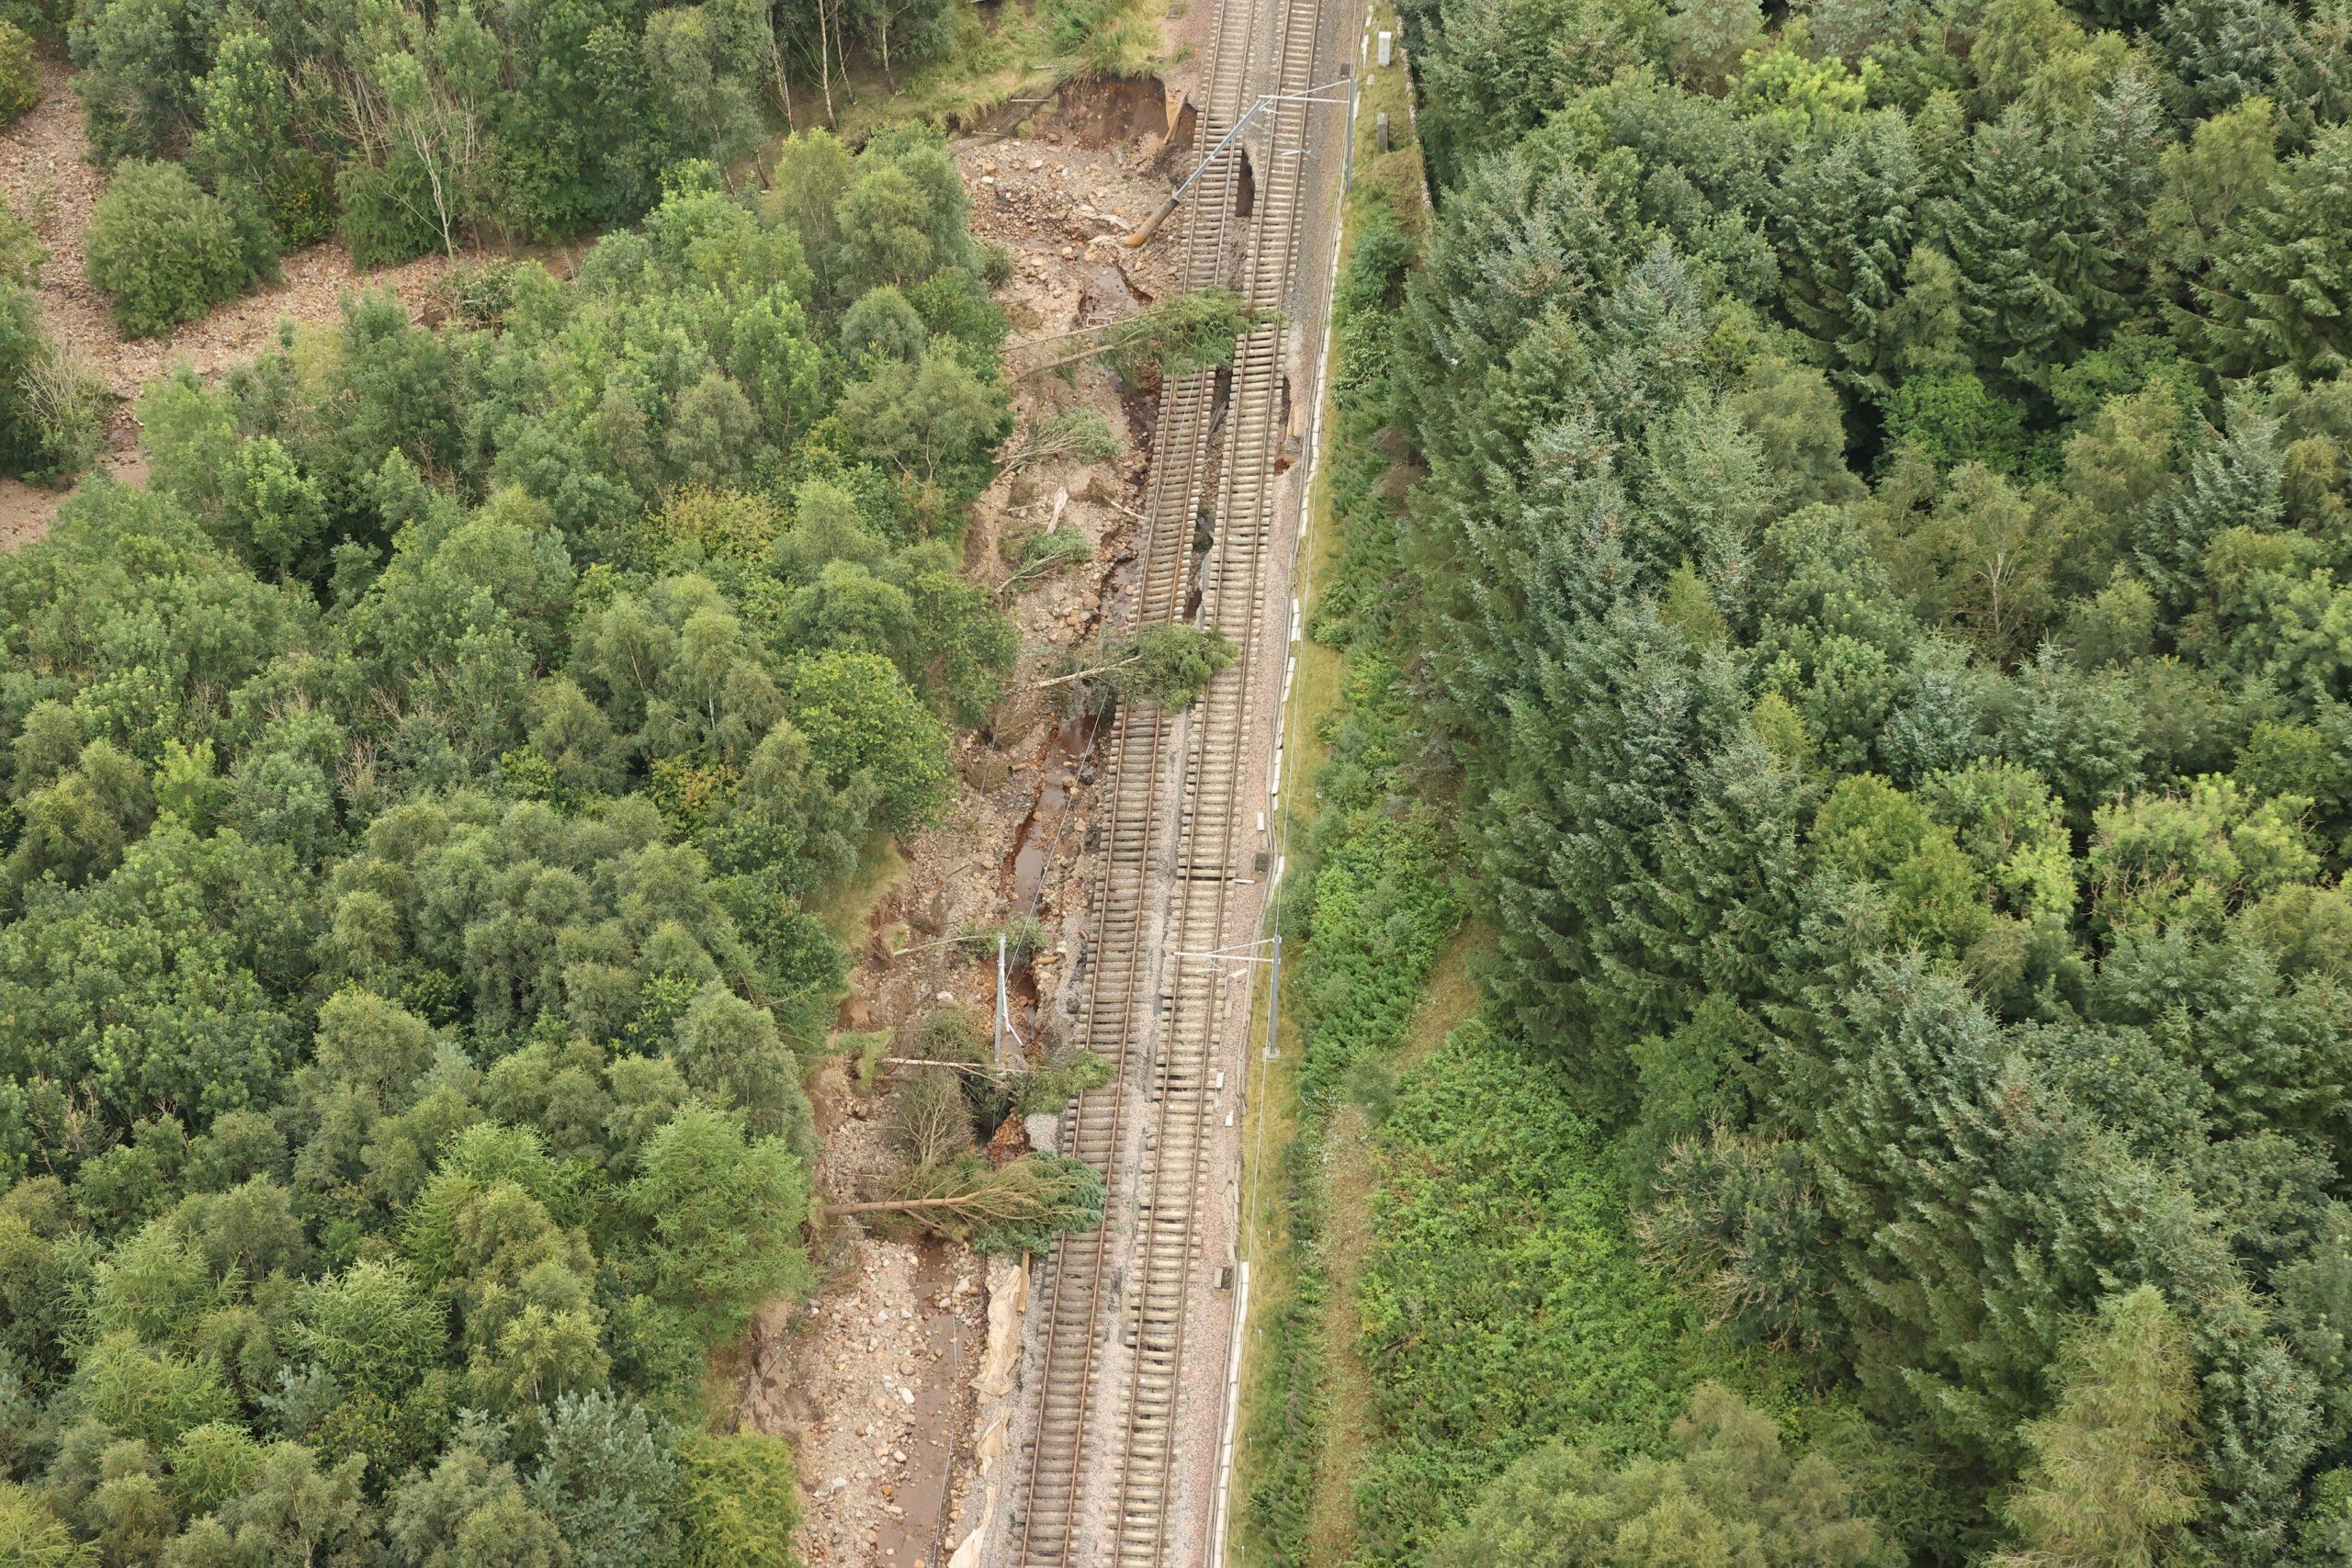 Aerial view of Glasgow Edinburgh railway line flooding